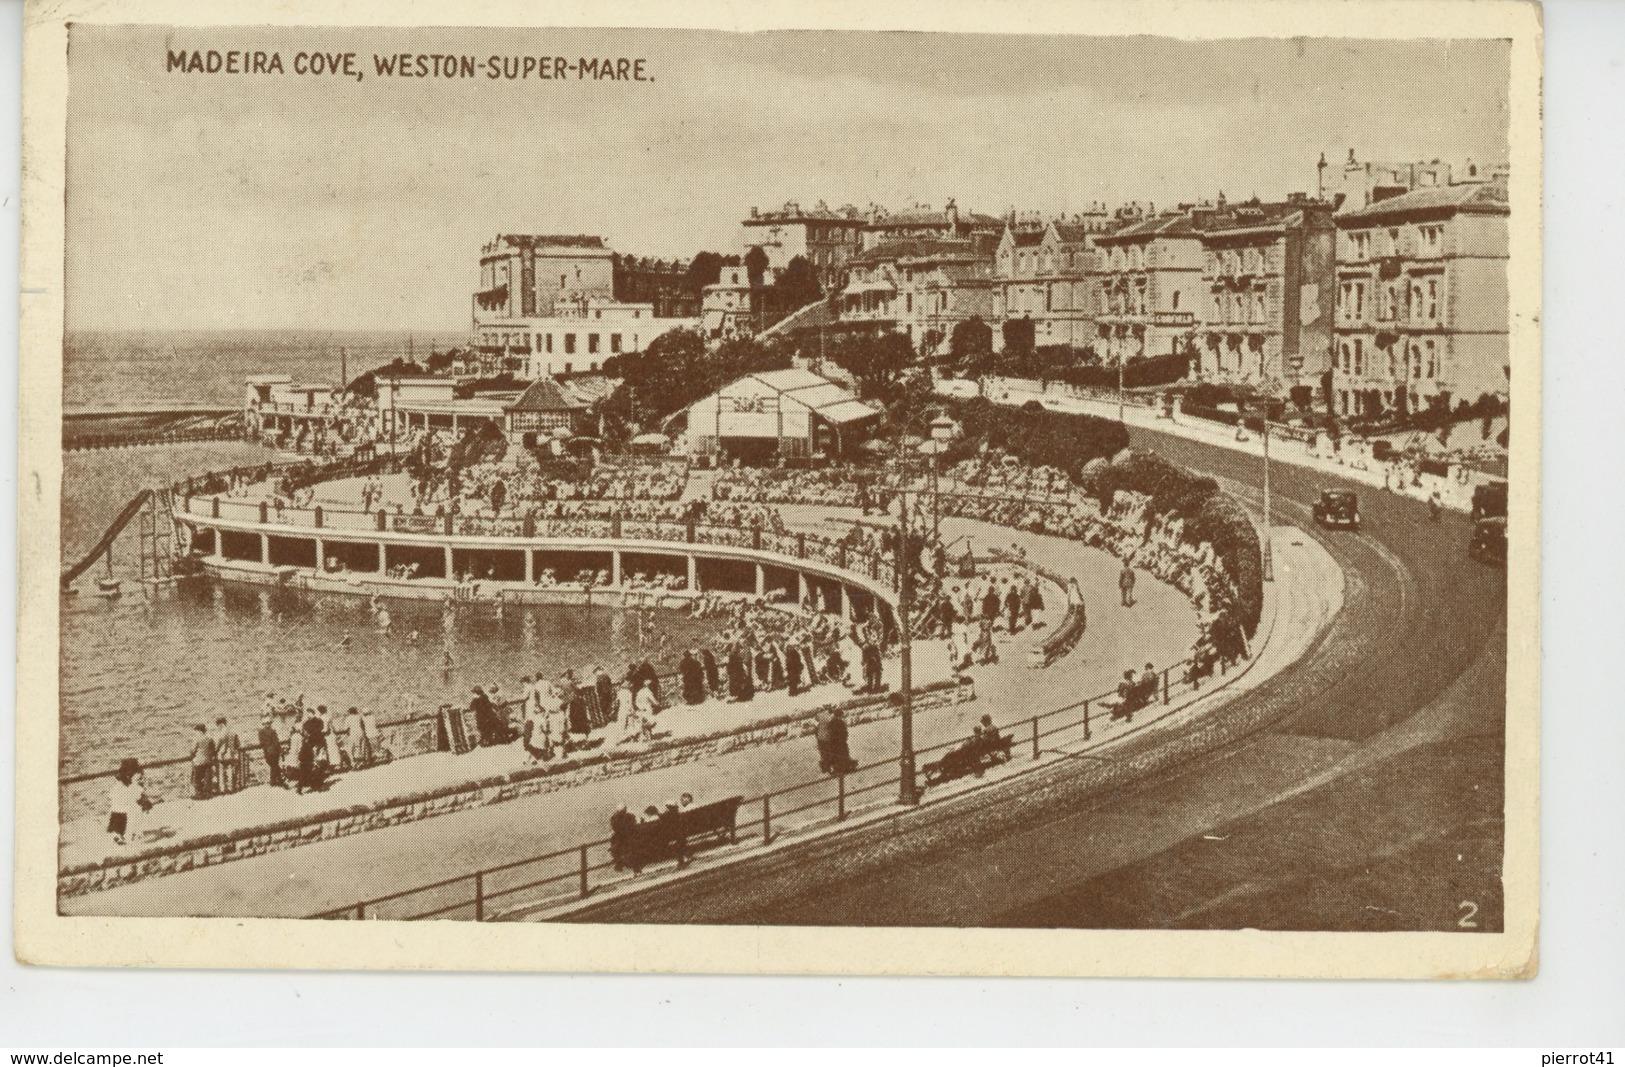 ROYAUME UNI - ENGLAND - WESTON SUPER MARE - Madeira Cove - Weston-Super-Mare